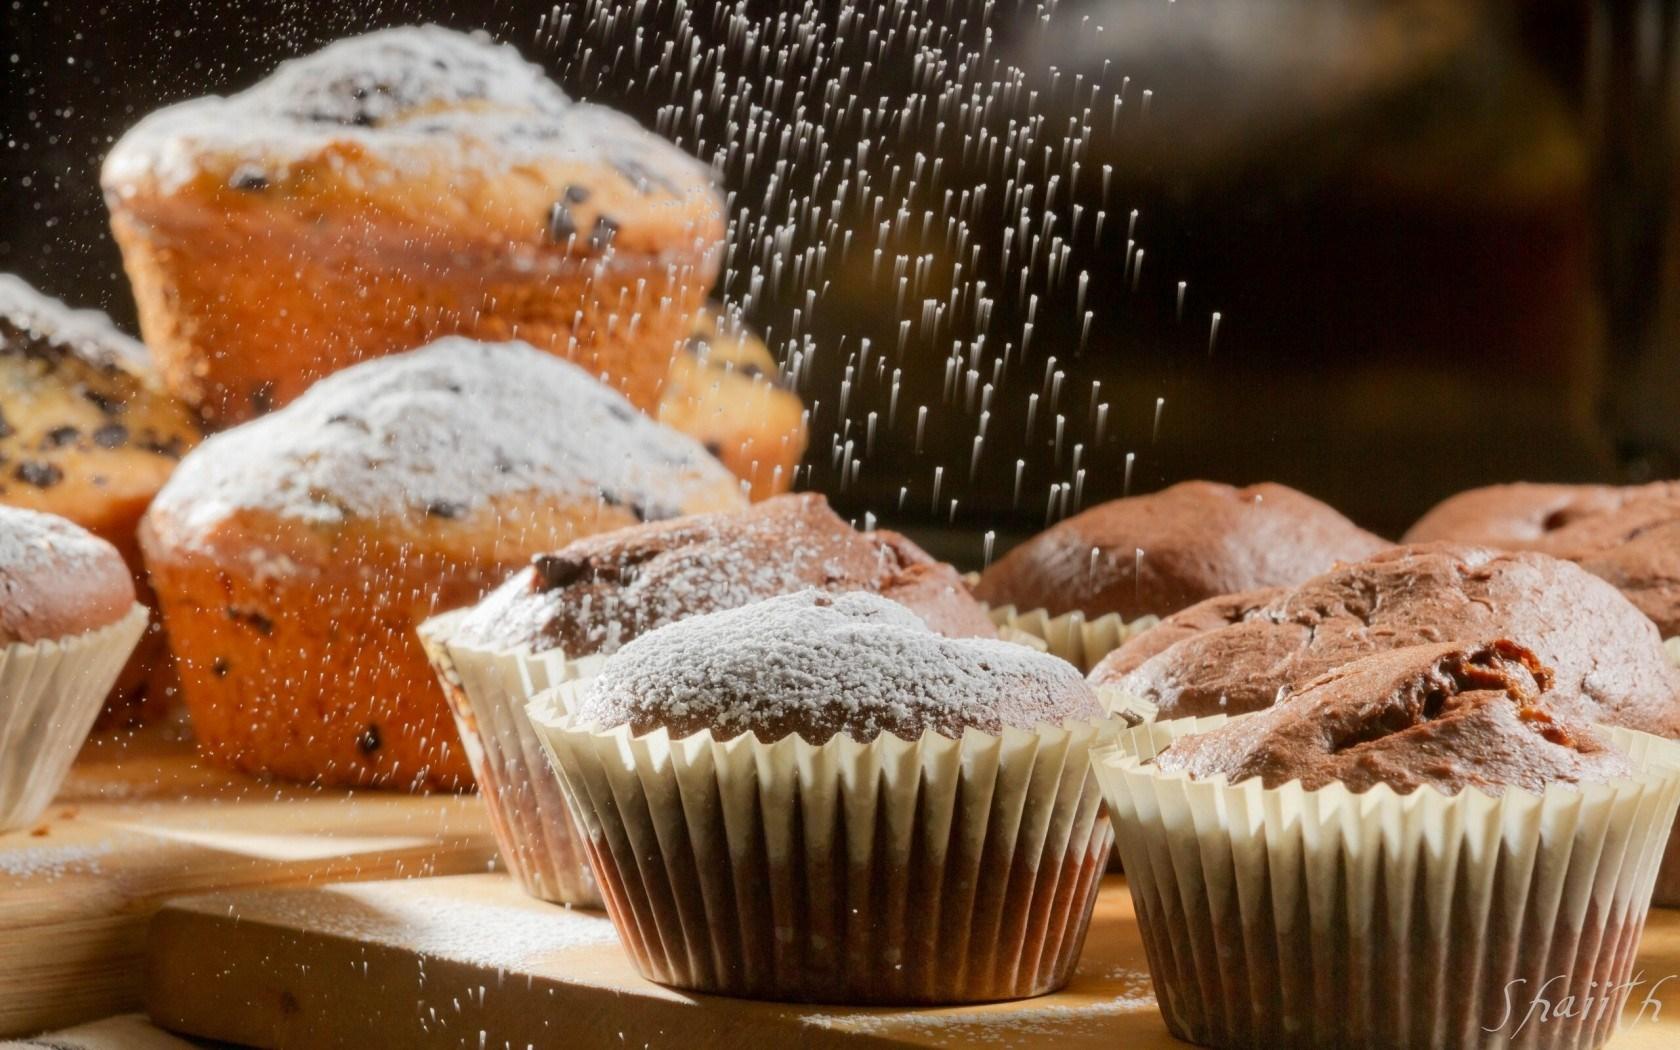 Cupcakes Icing Sugar Baking